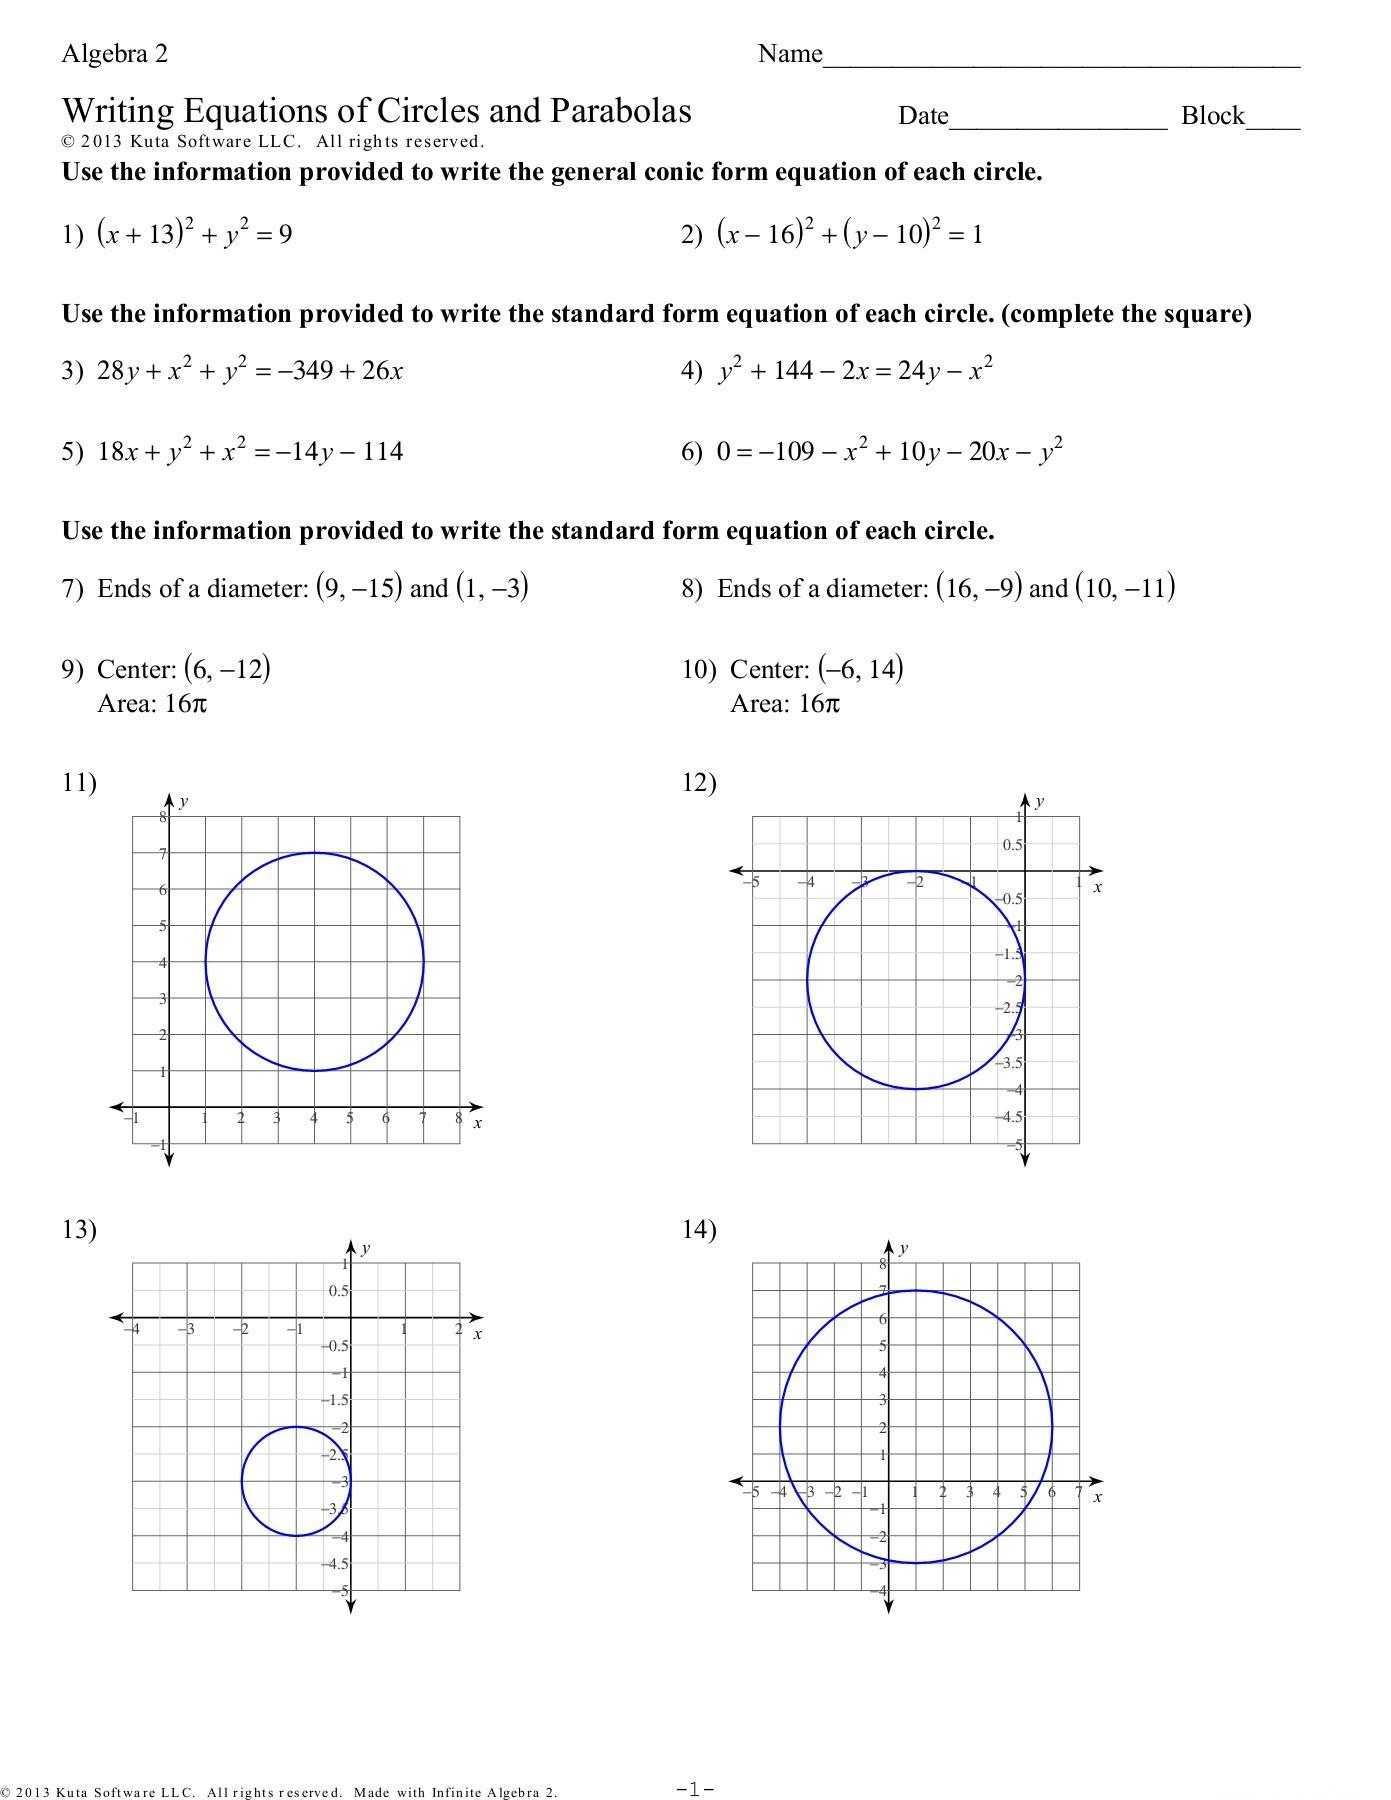 Equations Of Circles Worksheet Algebra 2 Writing Equations Of Circles and Parabolas Pages